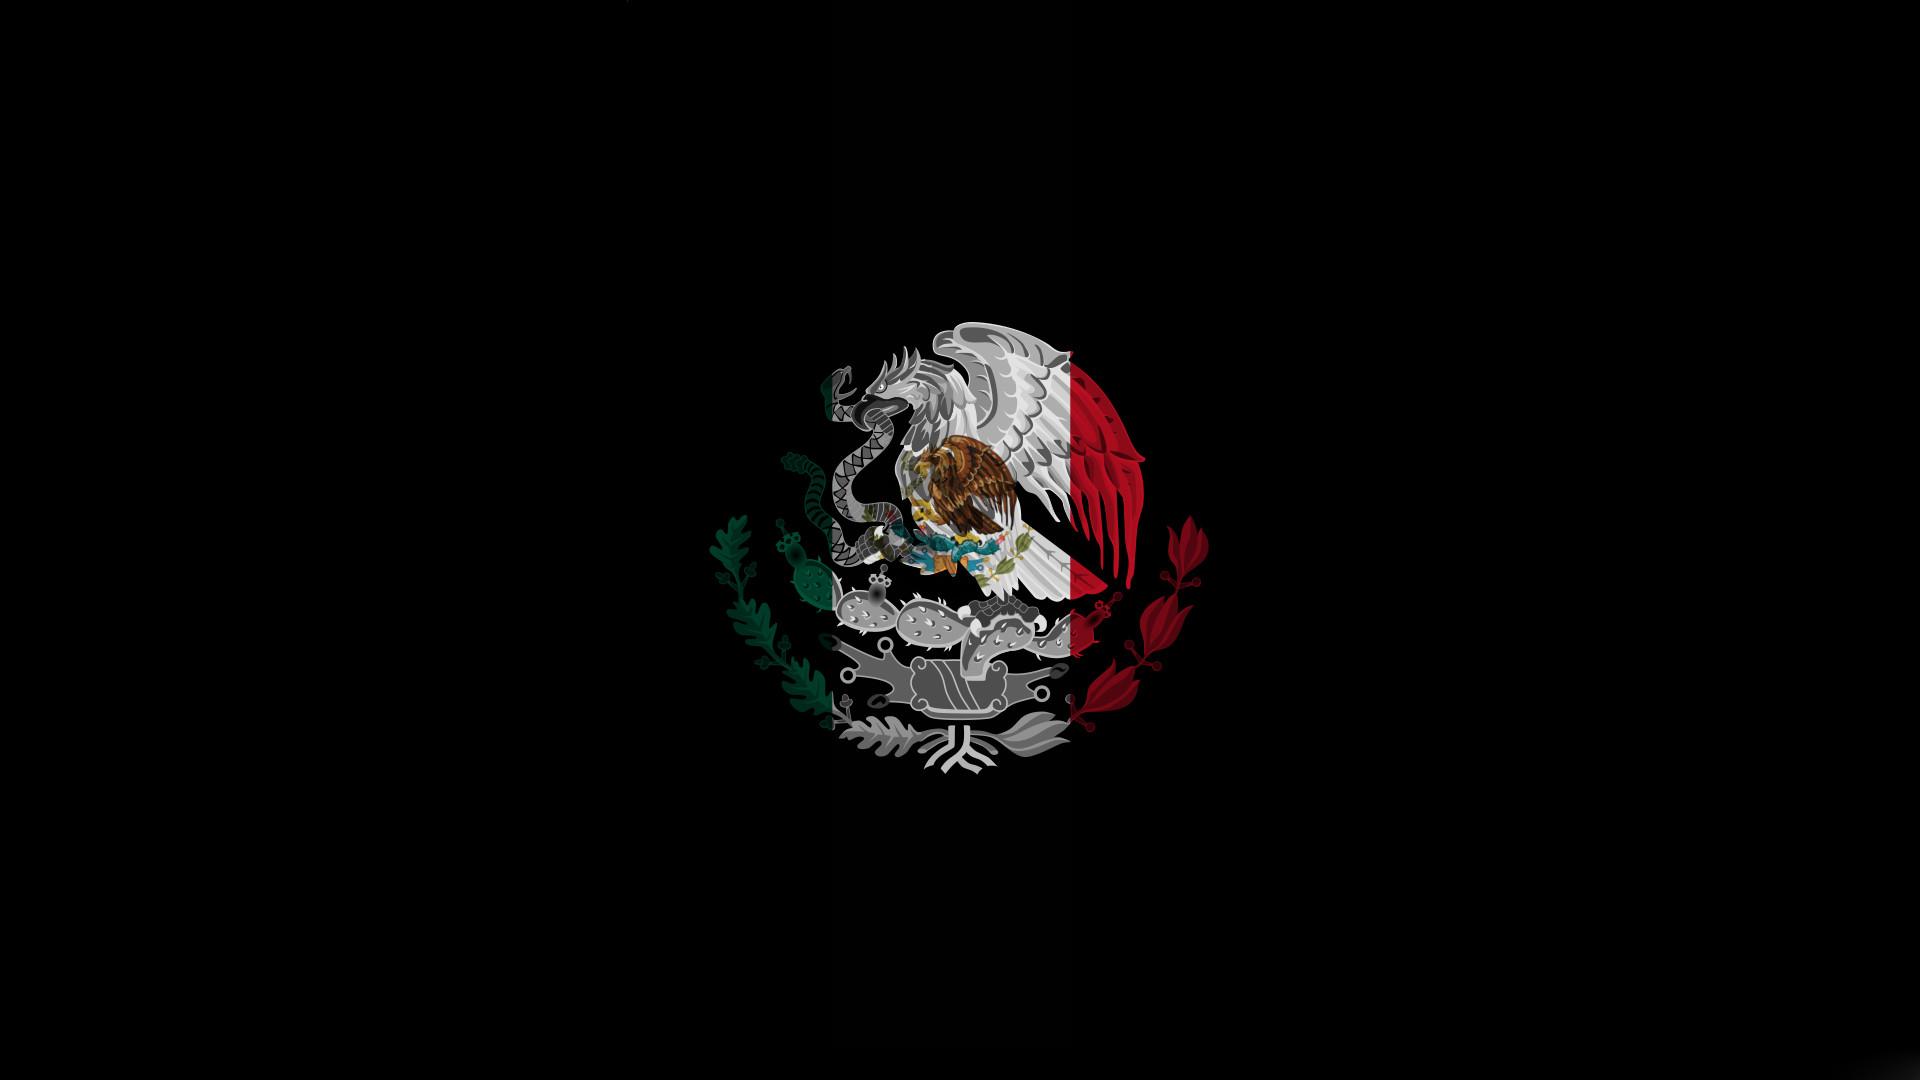 mexico soccer logo wallpaper (52+ images)